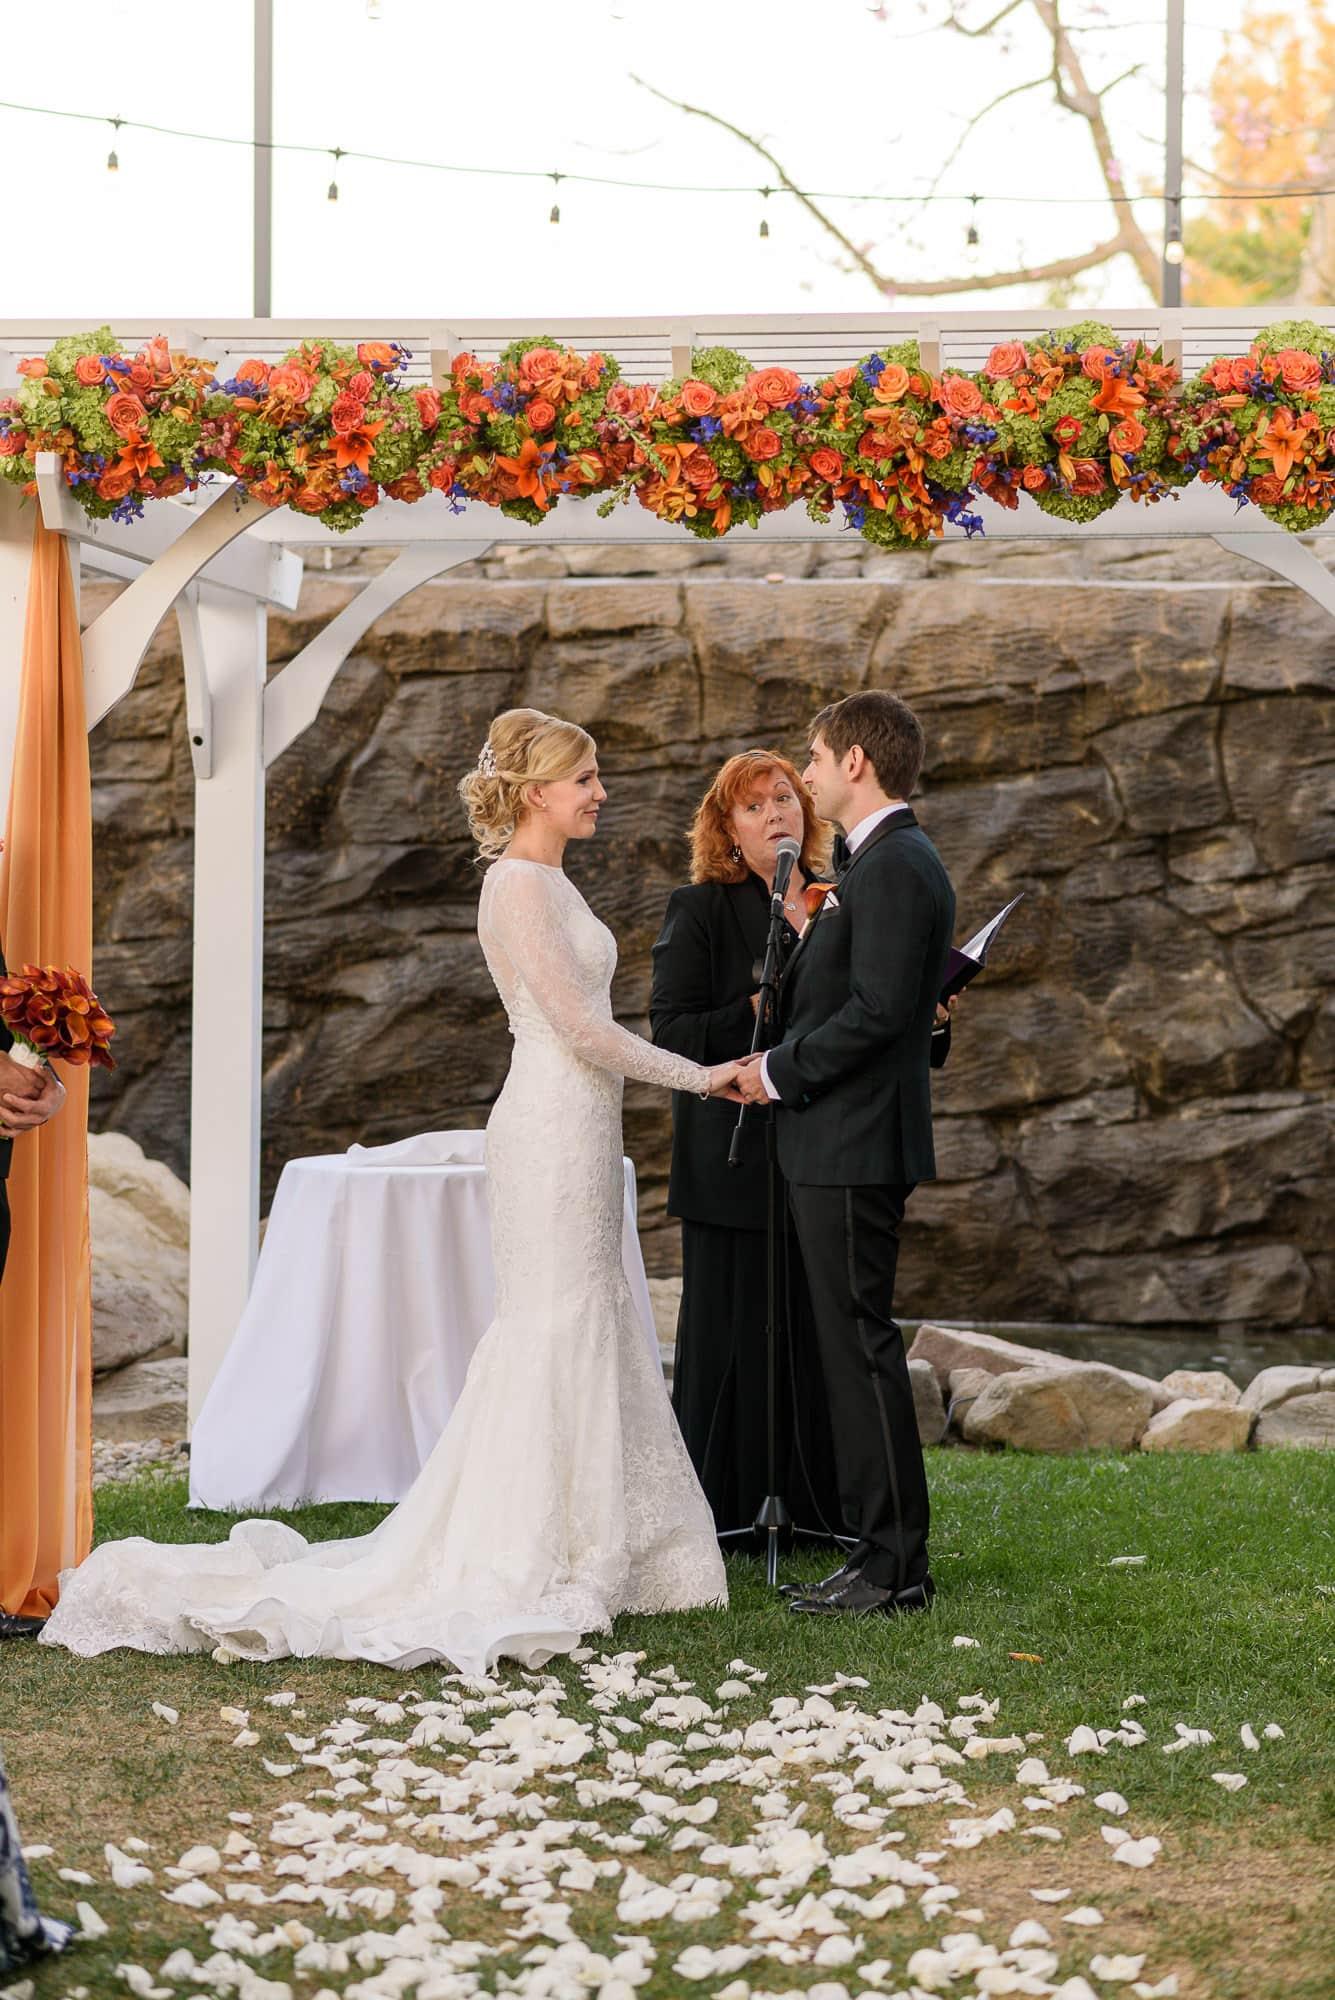 045_Alan_and_Heidi_Los_Angeles_Equestrian_Center_Wedding